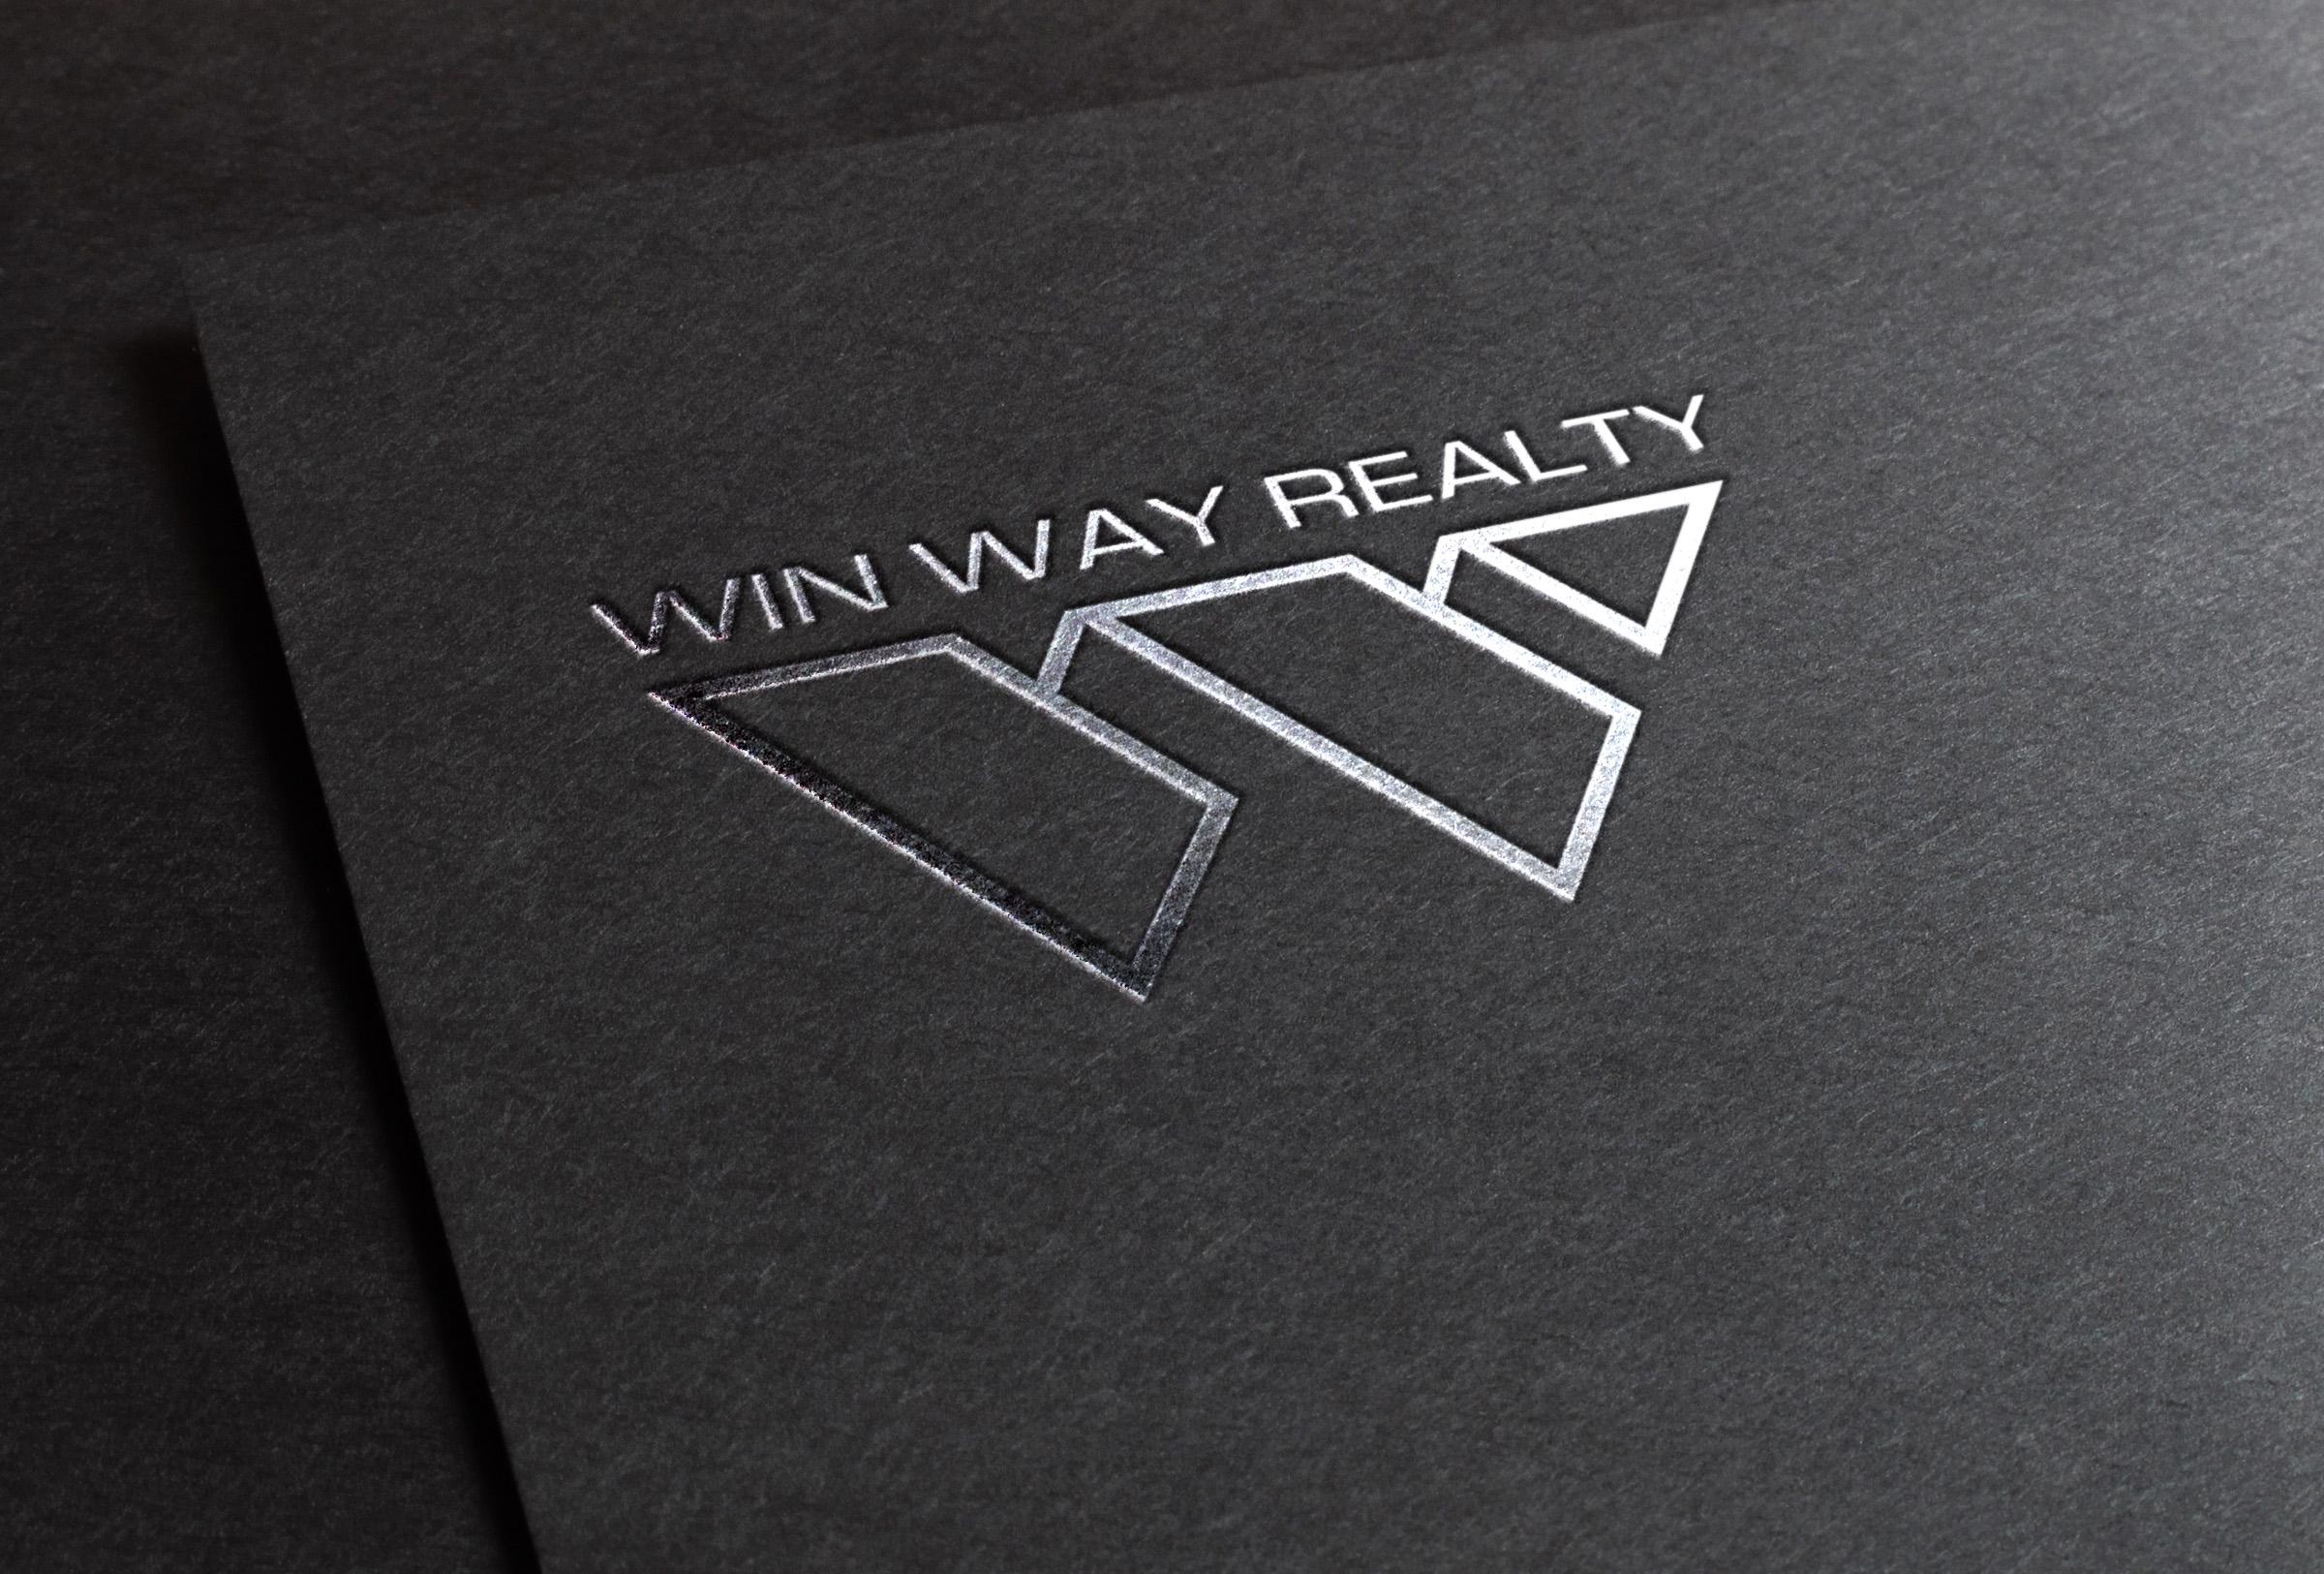 Логотип для агентства недвижимости фото f_7815aa92882a2004.jpg